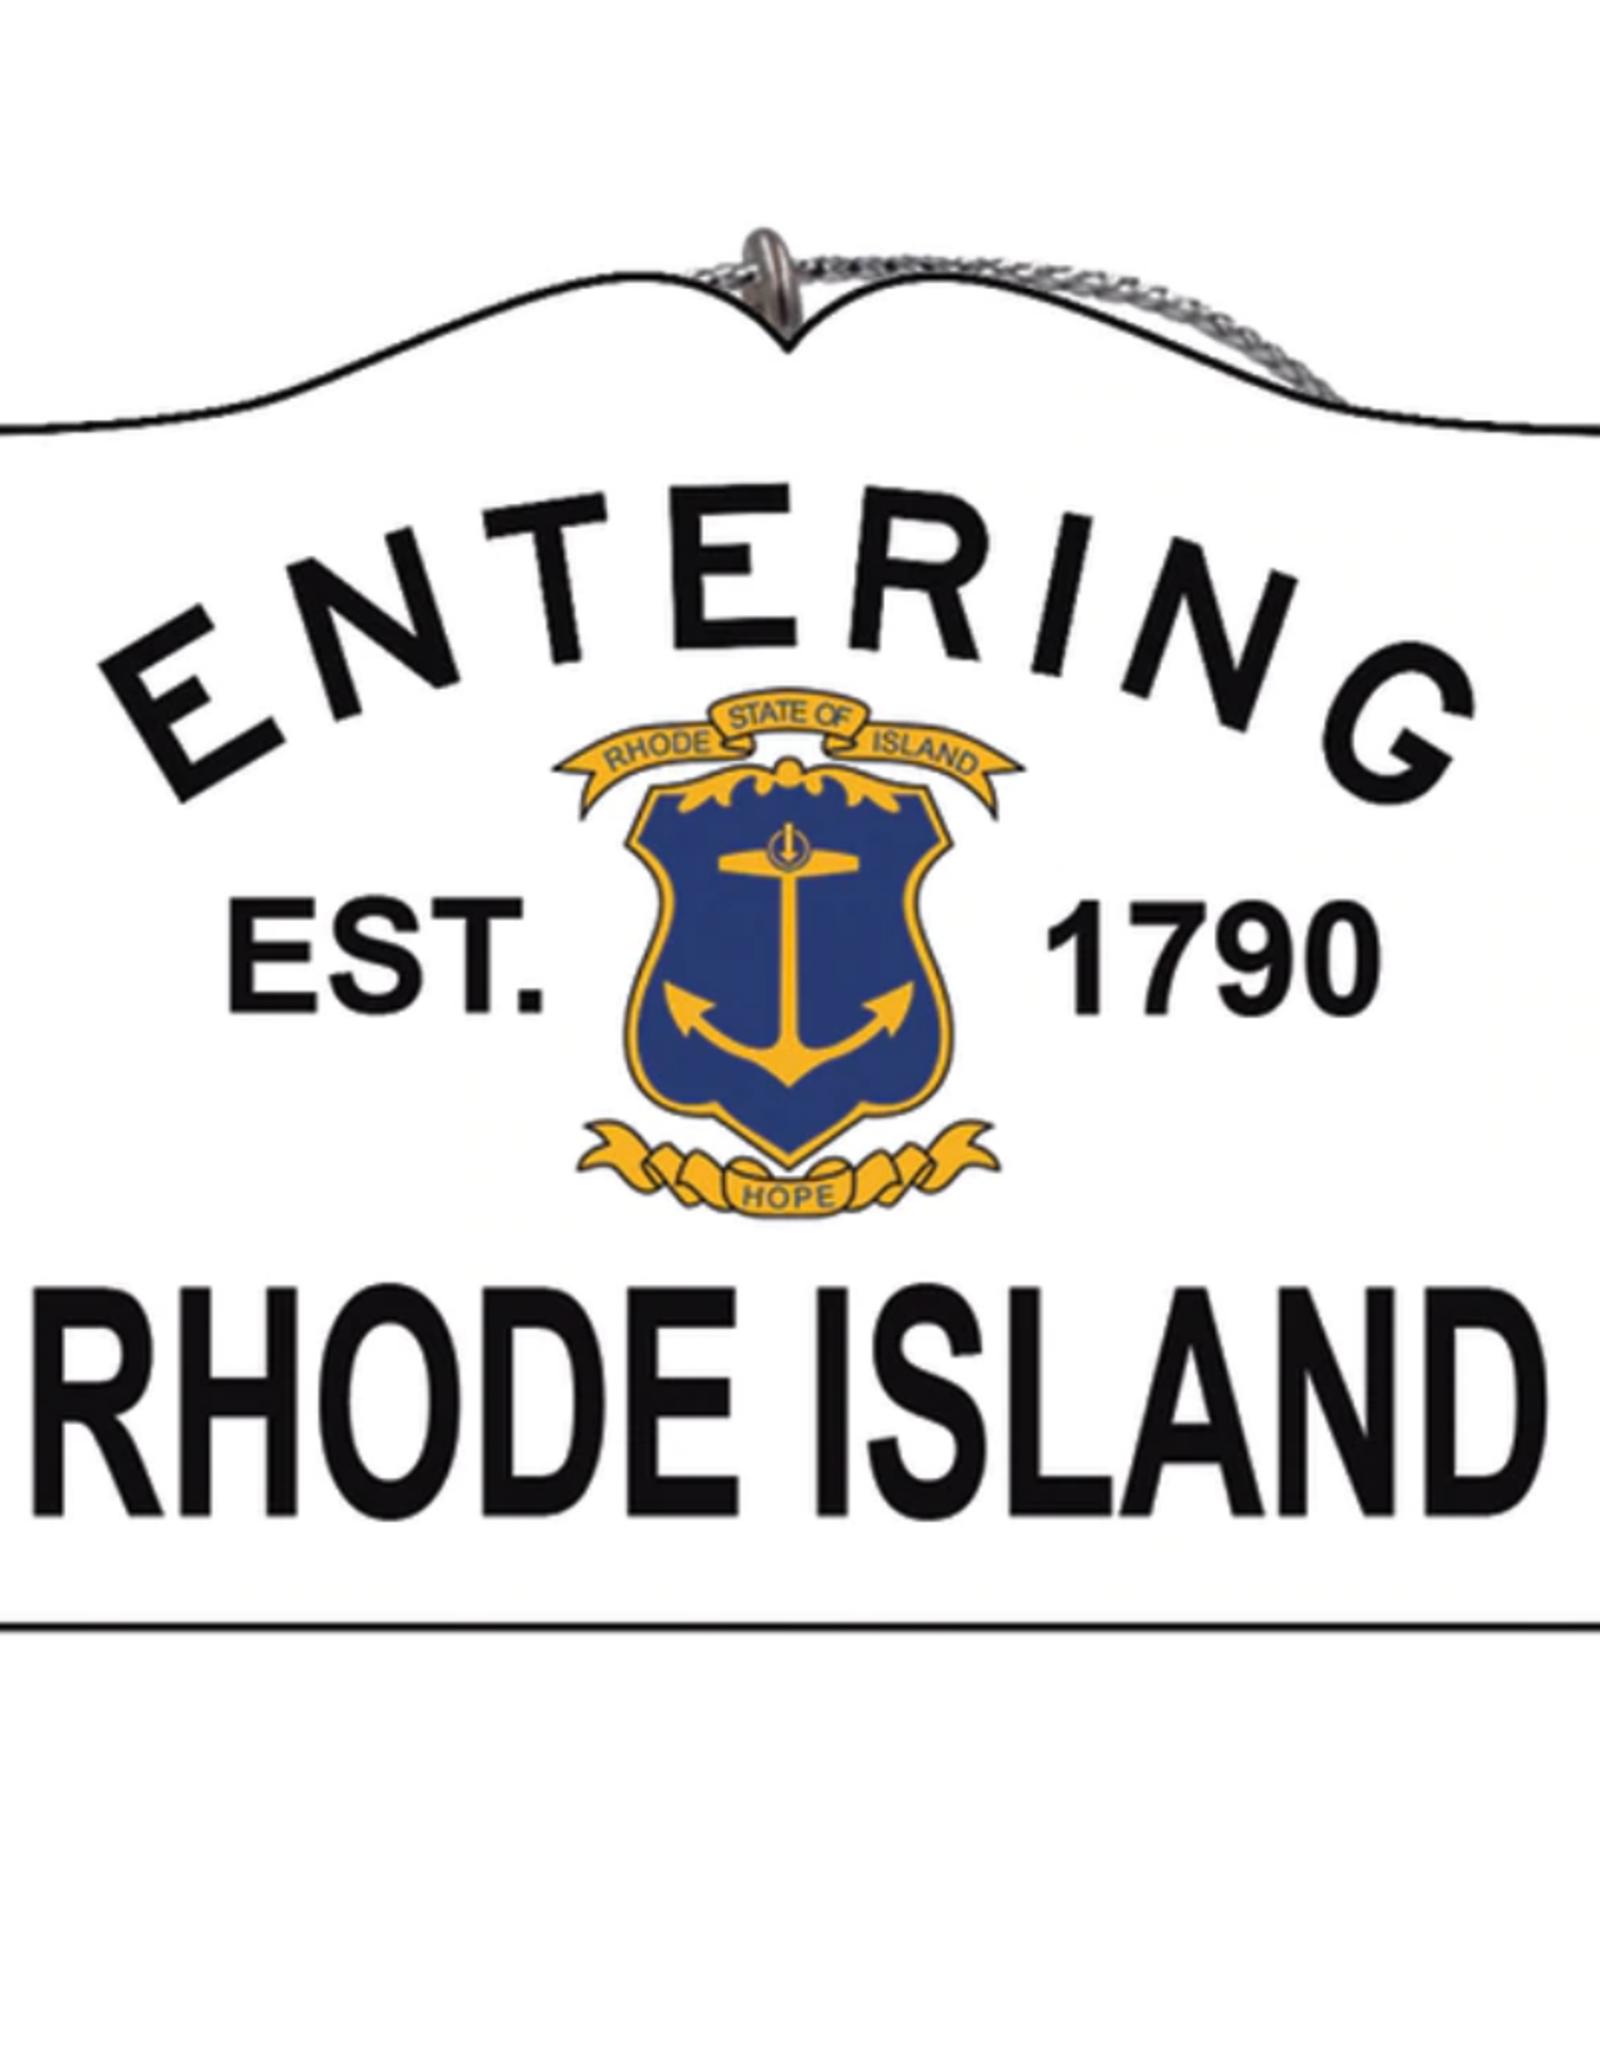 Entering Rhode Island Ornament